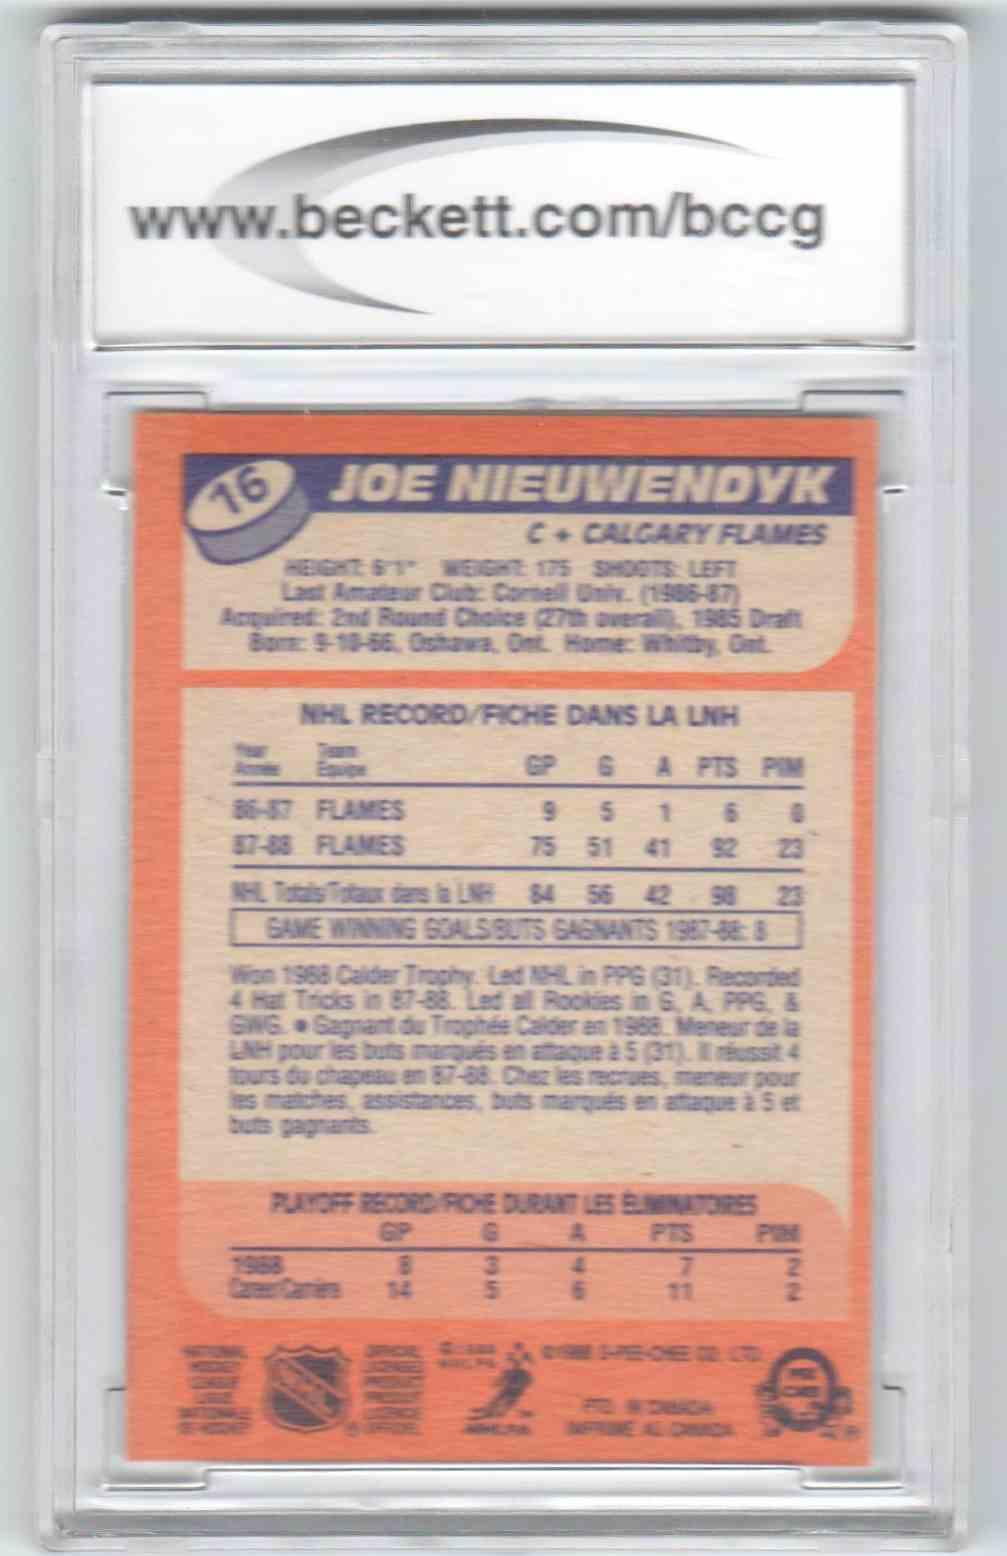 1988-89 O-Pee-Chee Joe Nieuwendyk #16 card back image